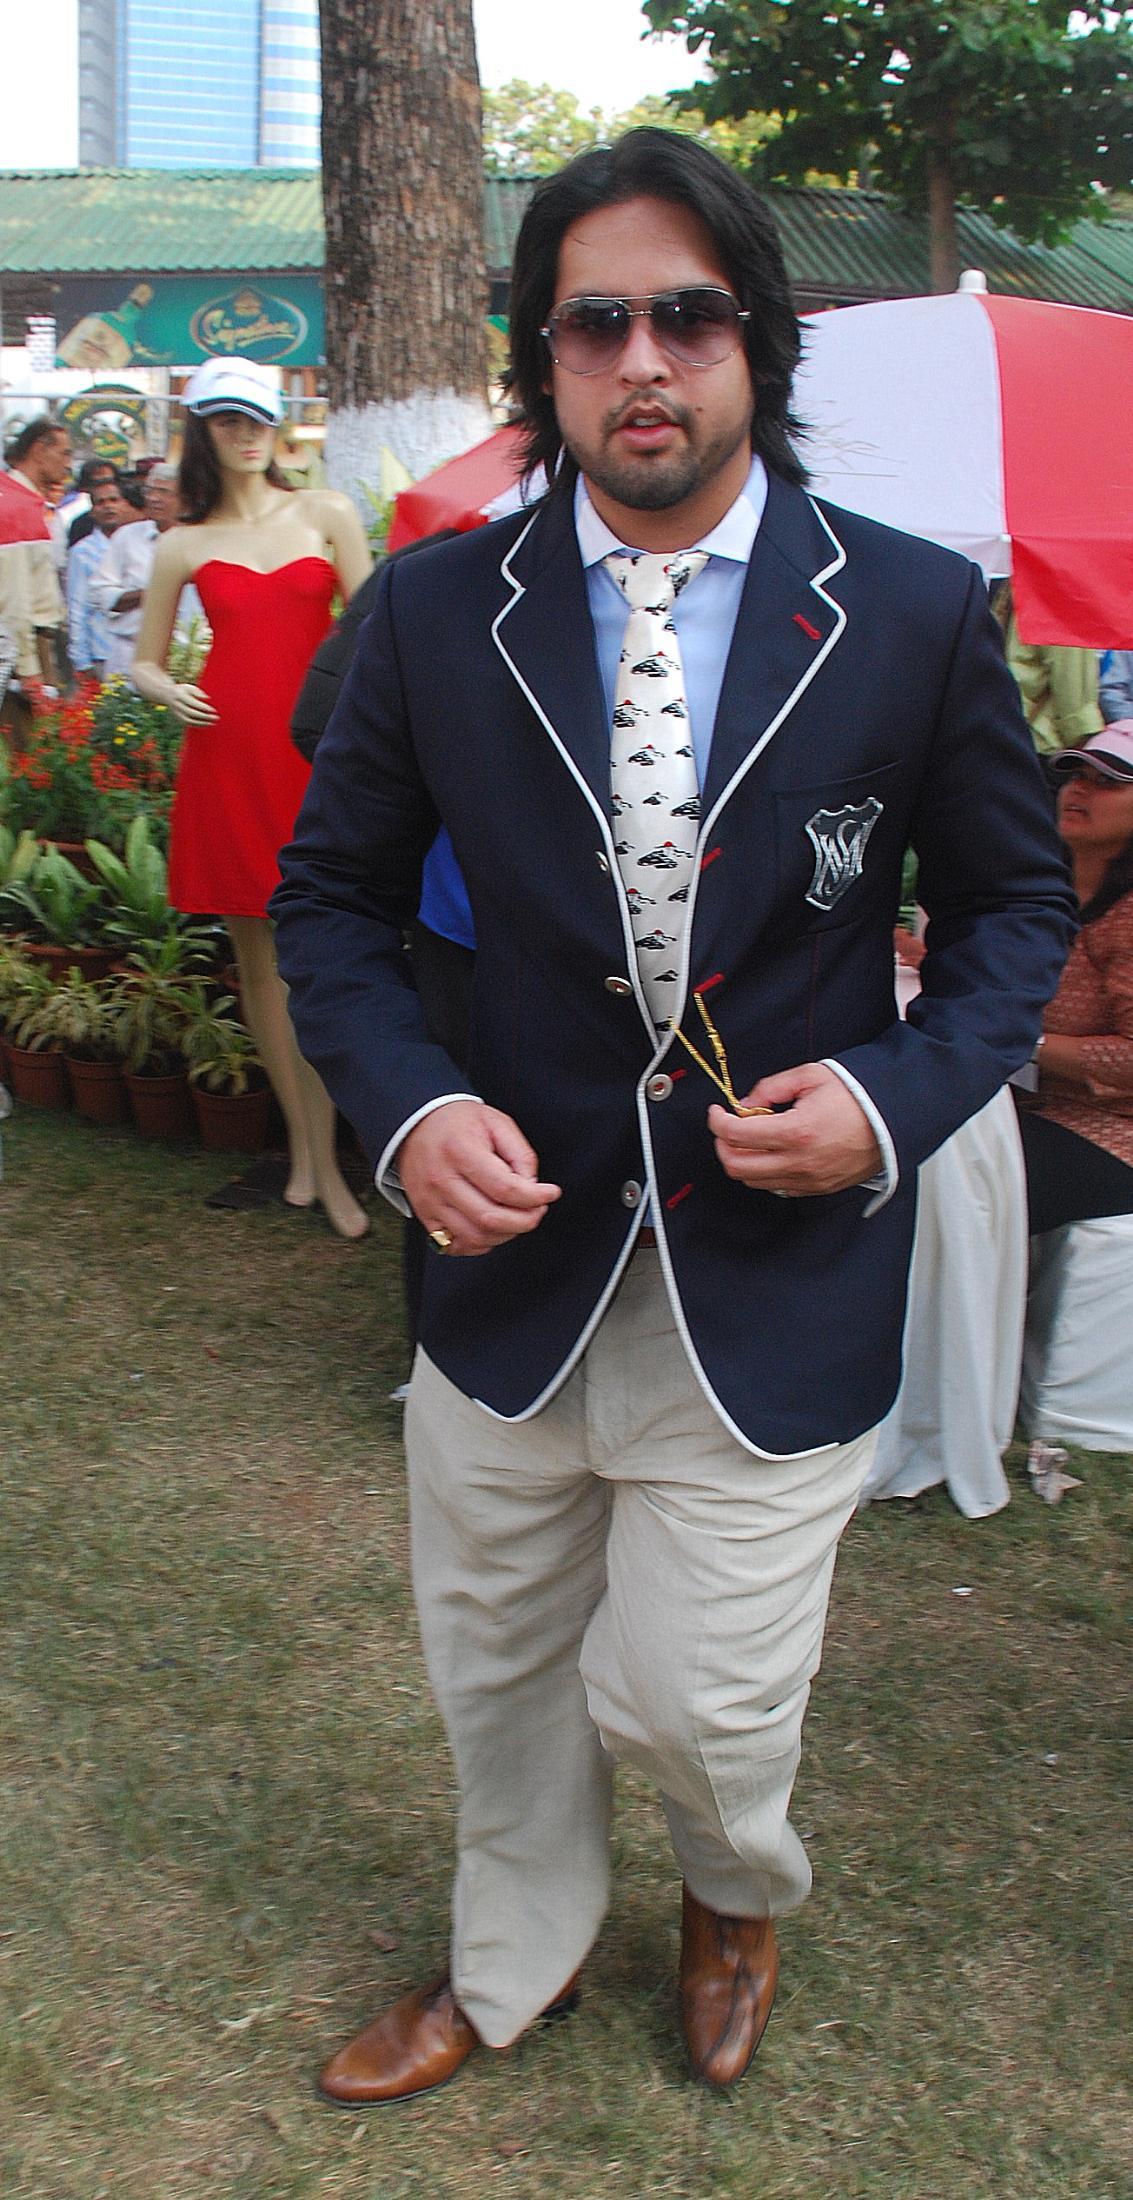 Dr Vijay Mallya: mallya : Dr Vijay Mallya ... : Dr Vijay Mallya Photos ...